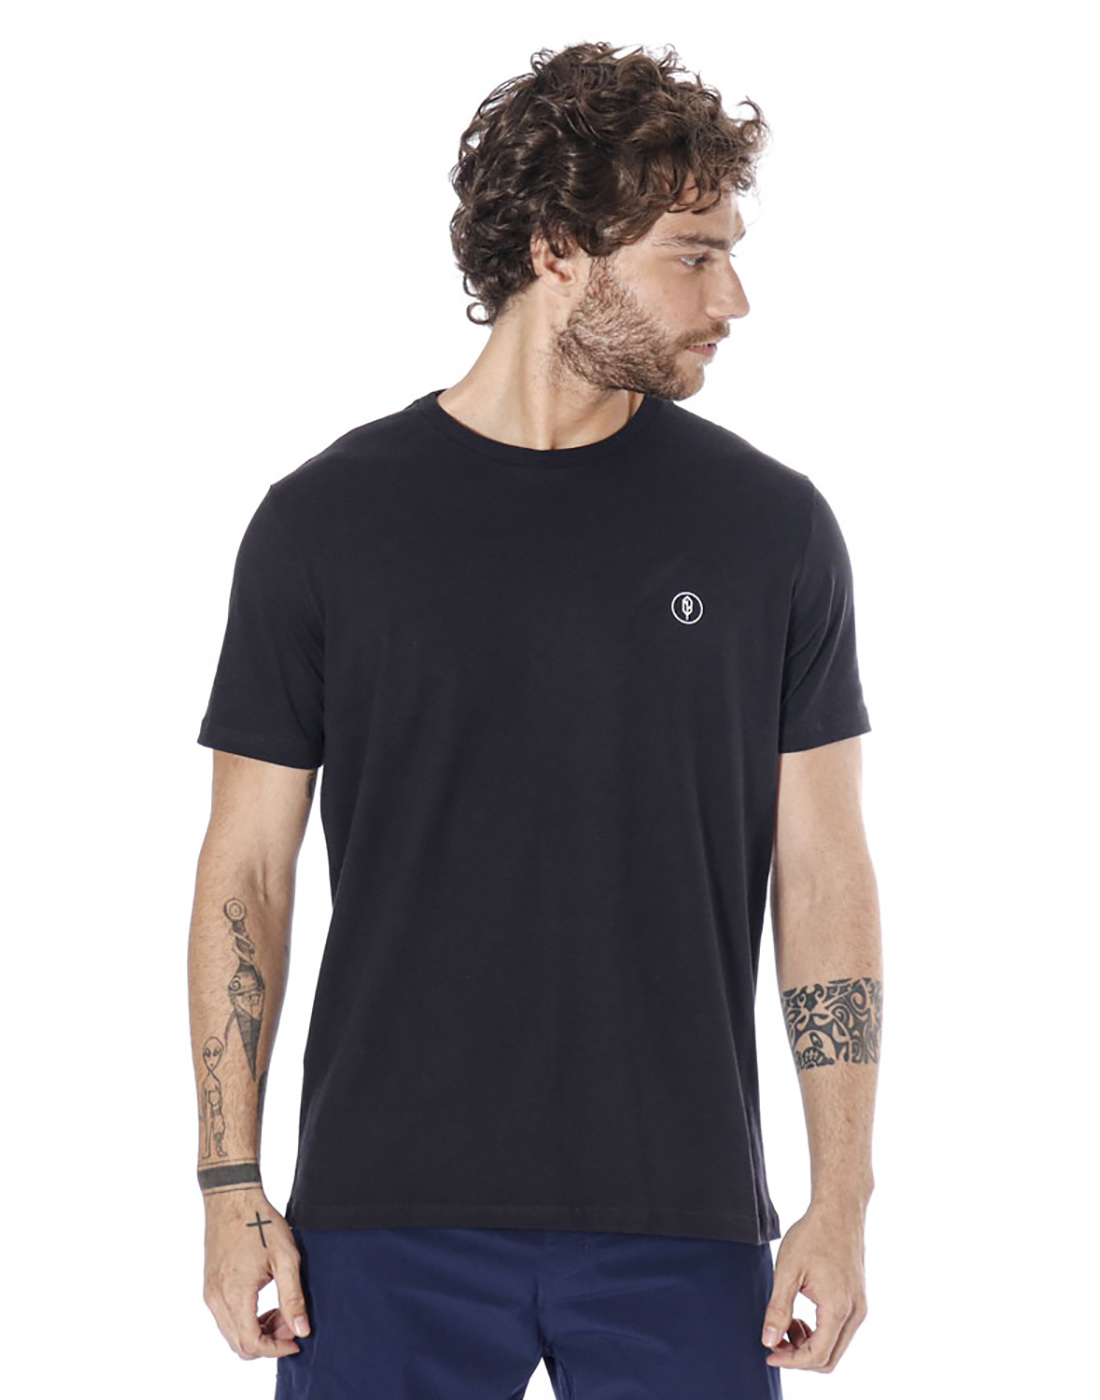 Camiseta Estampada Coqueiral Preto Pena